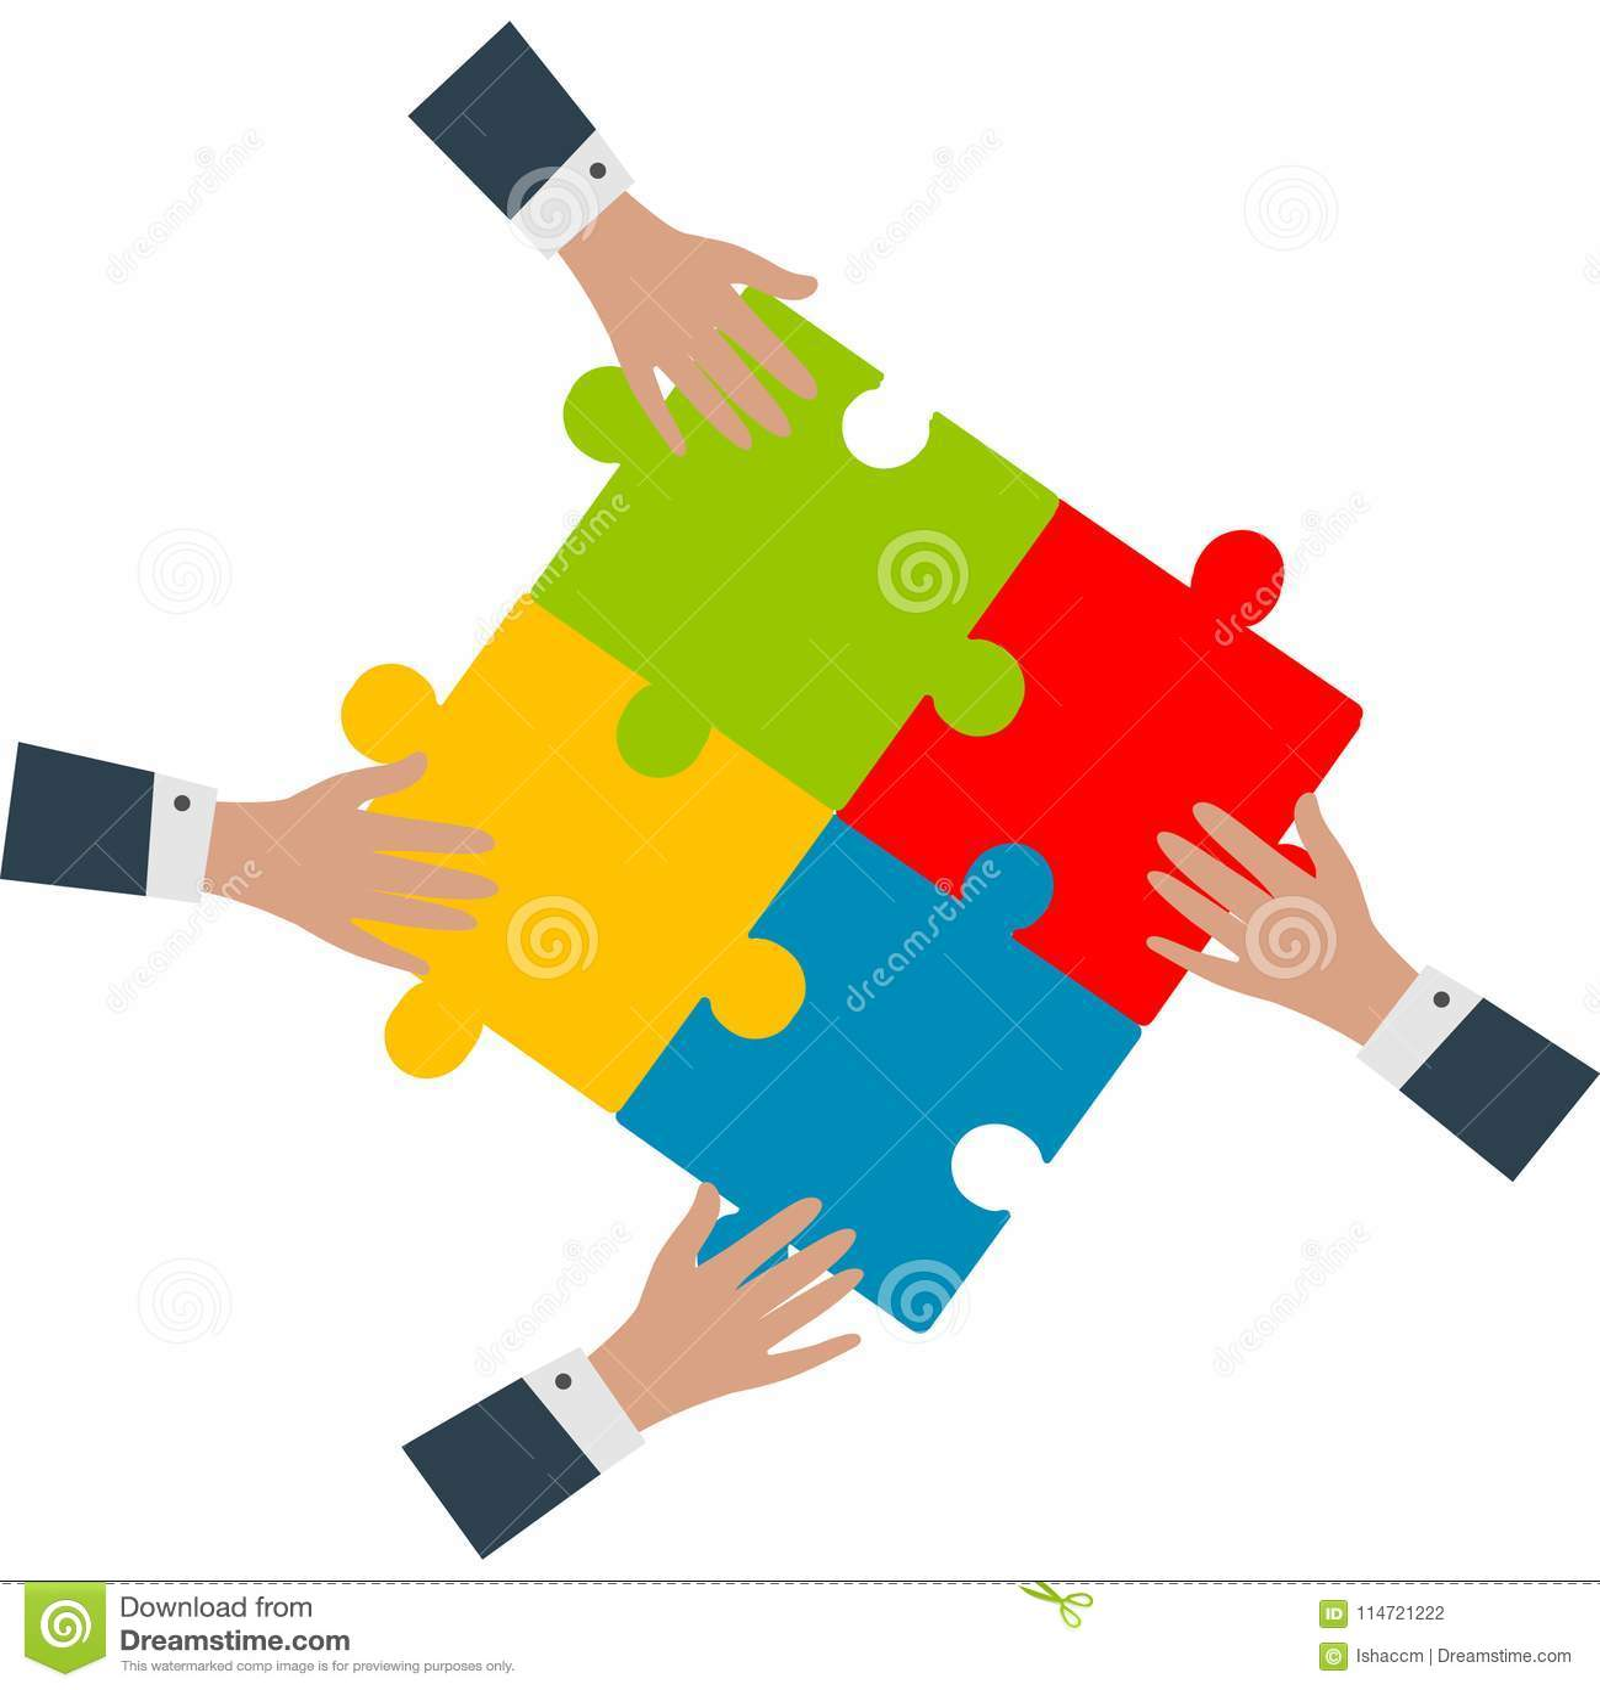 Team work concept.Hands assembling puzzles vector